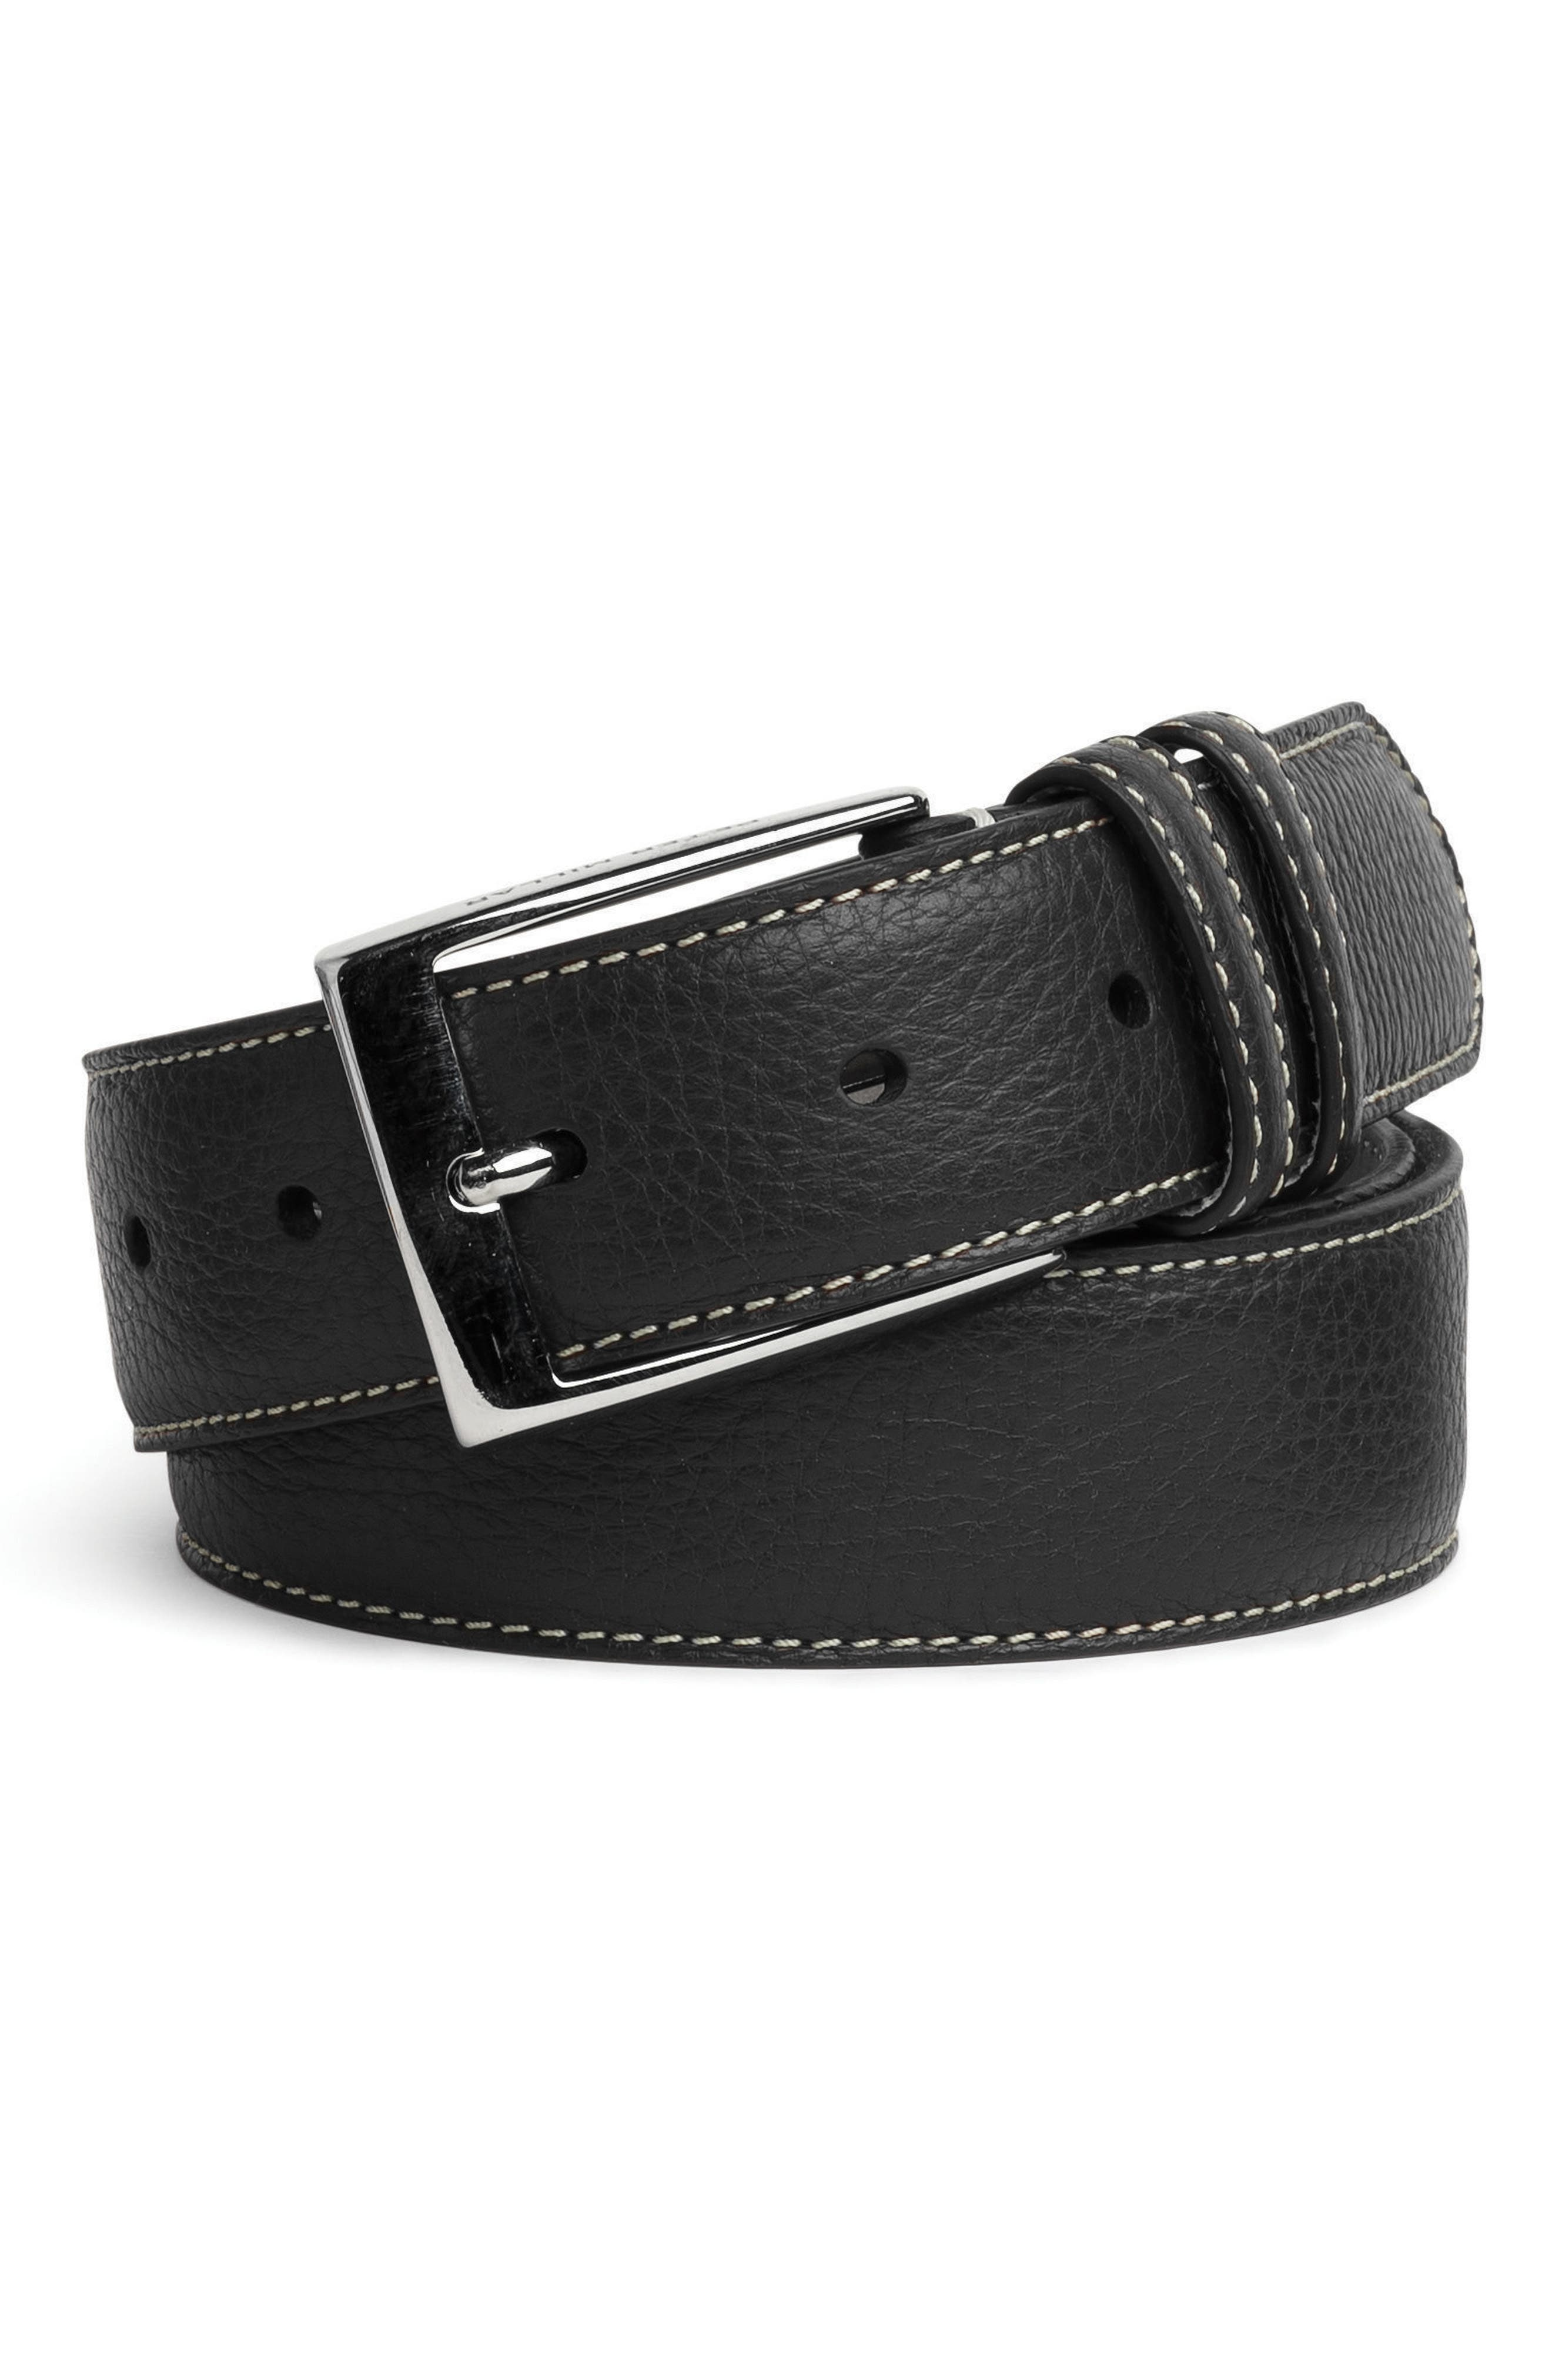 Peter Millar Pebbled Leather Belt